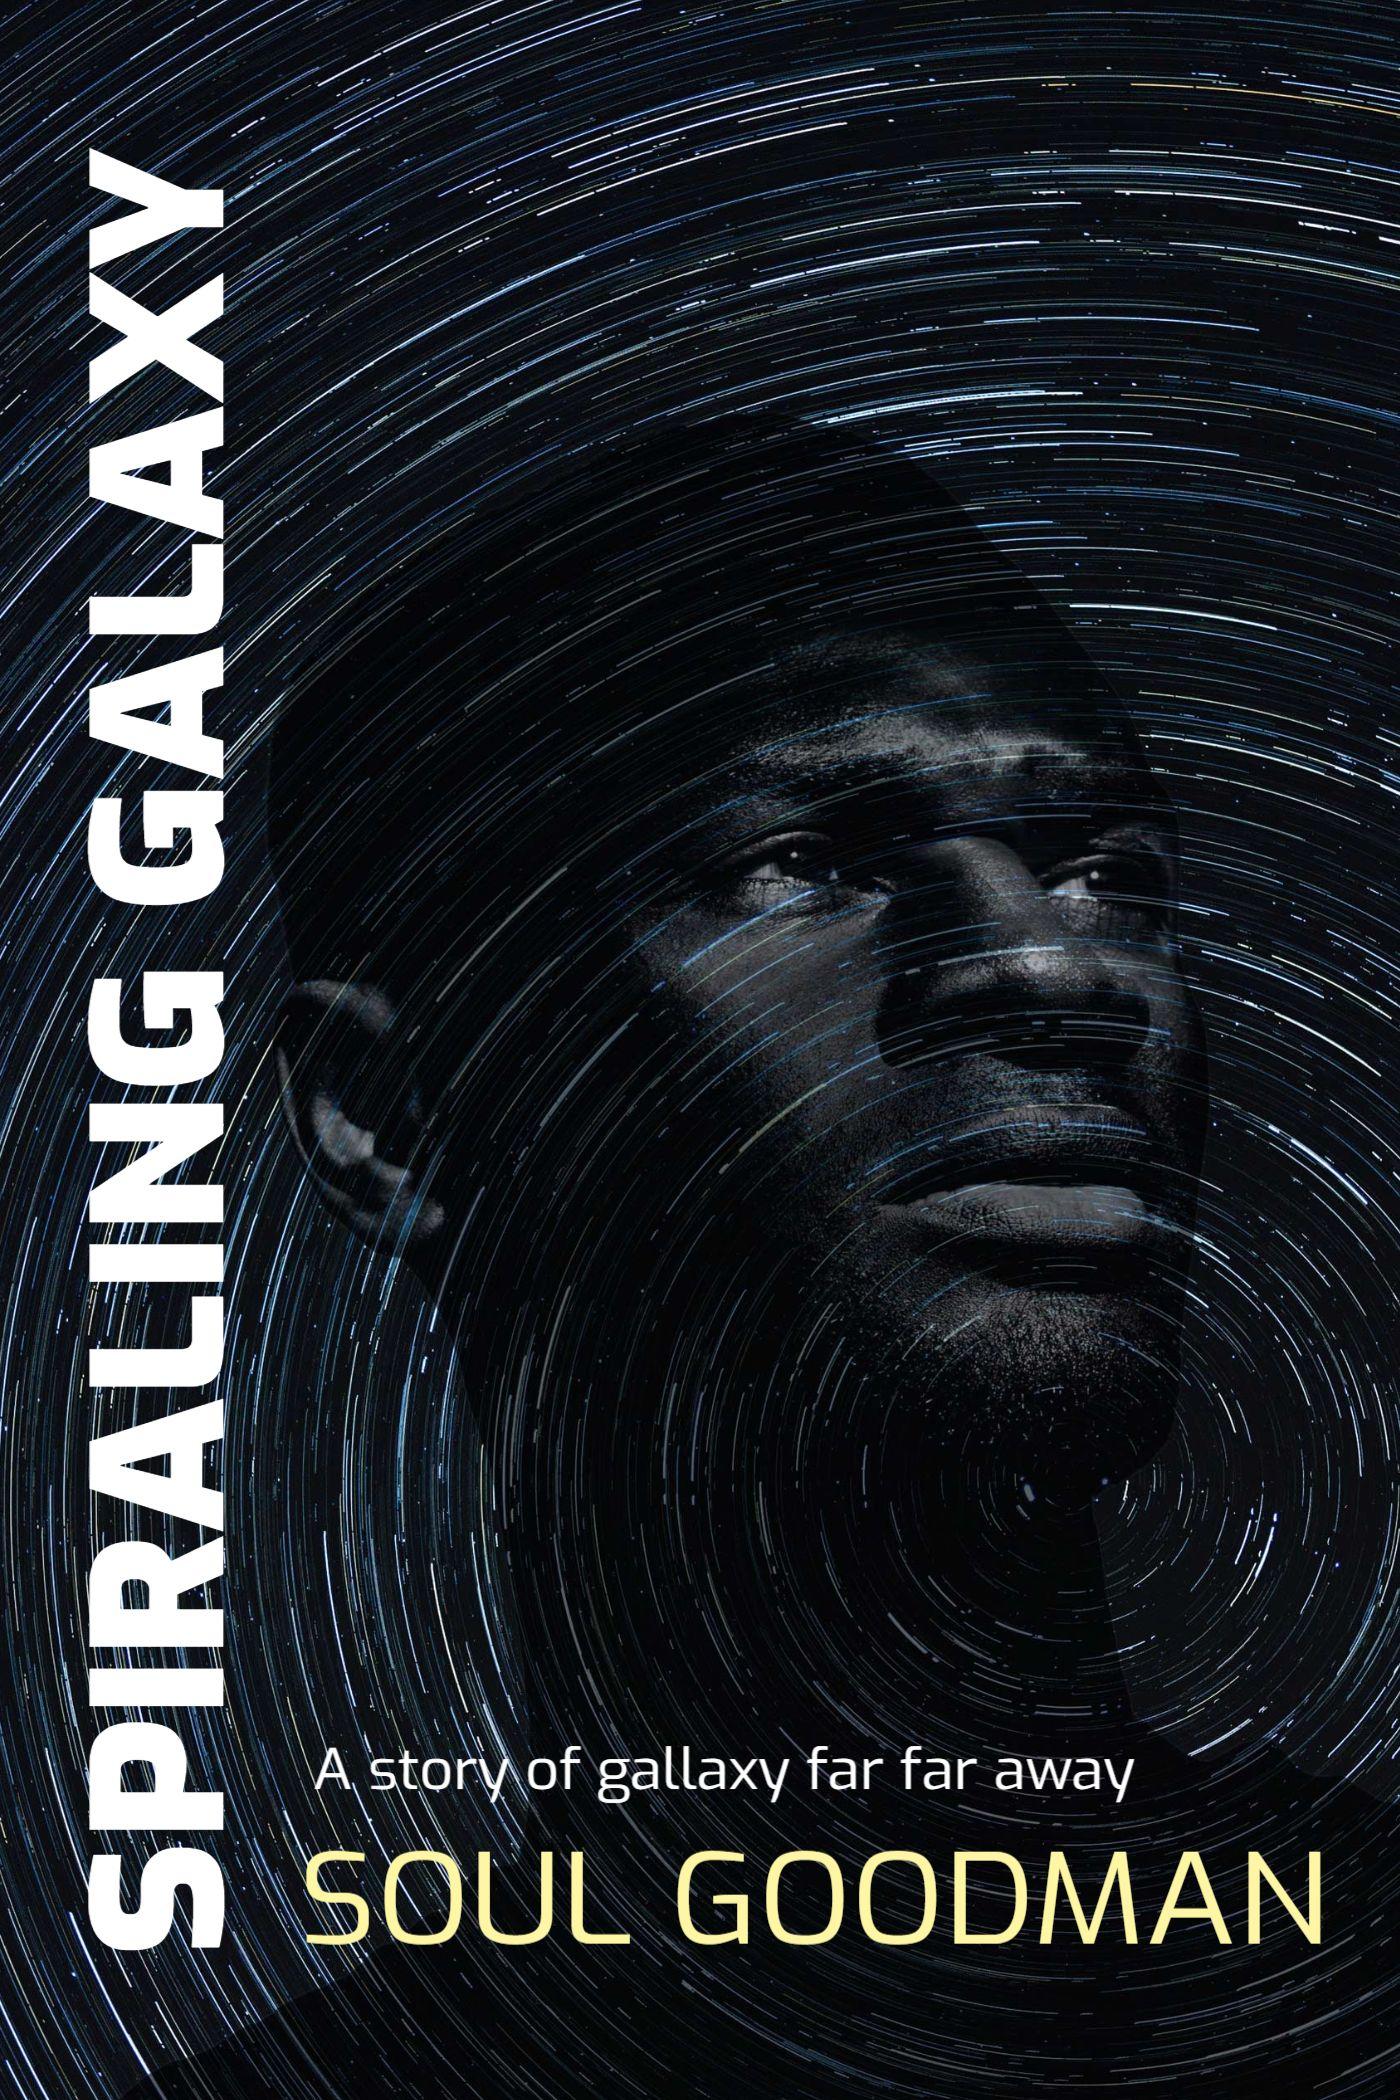 Spiraling Galaxy Book Cover Template